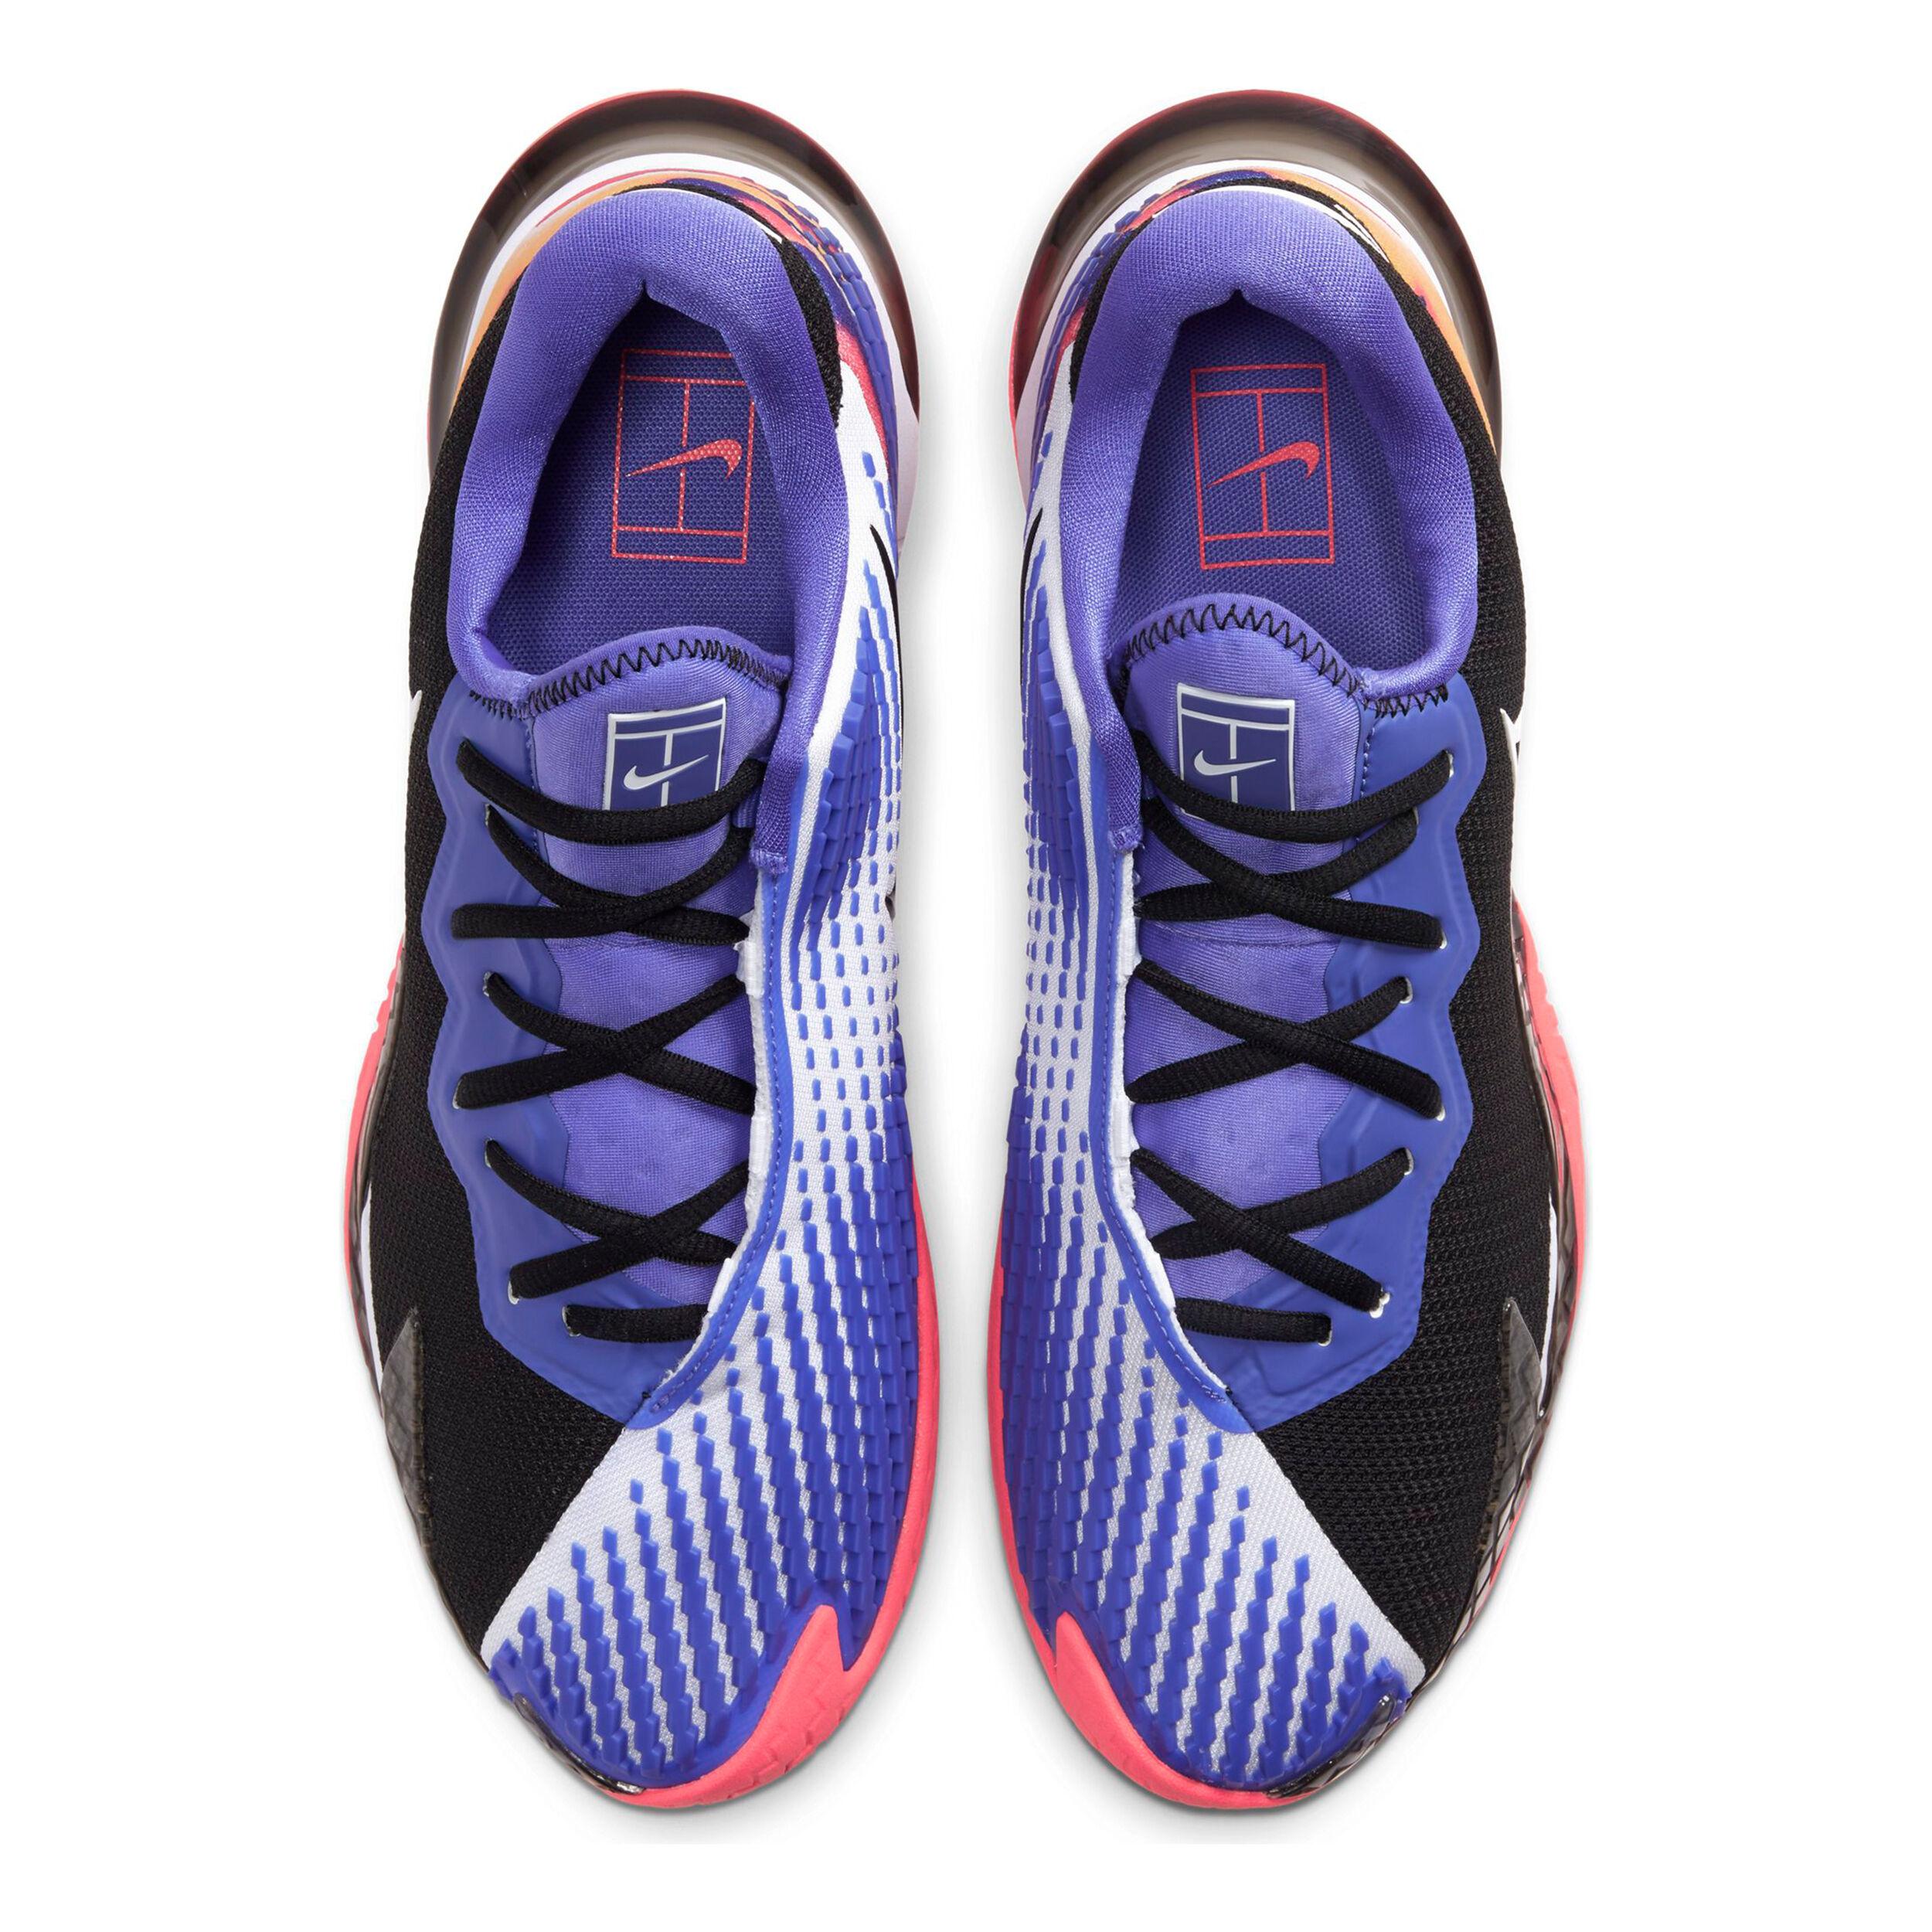 Nike Air Zoom Vapor Cage 4 Chaussure Tout Terrain Hommes - Noir ...